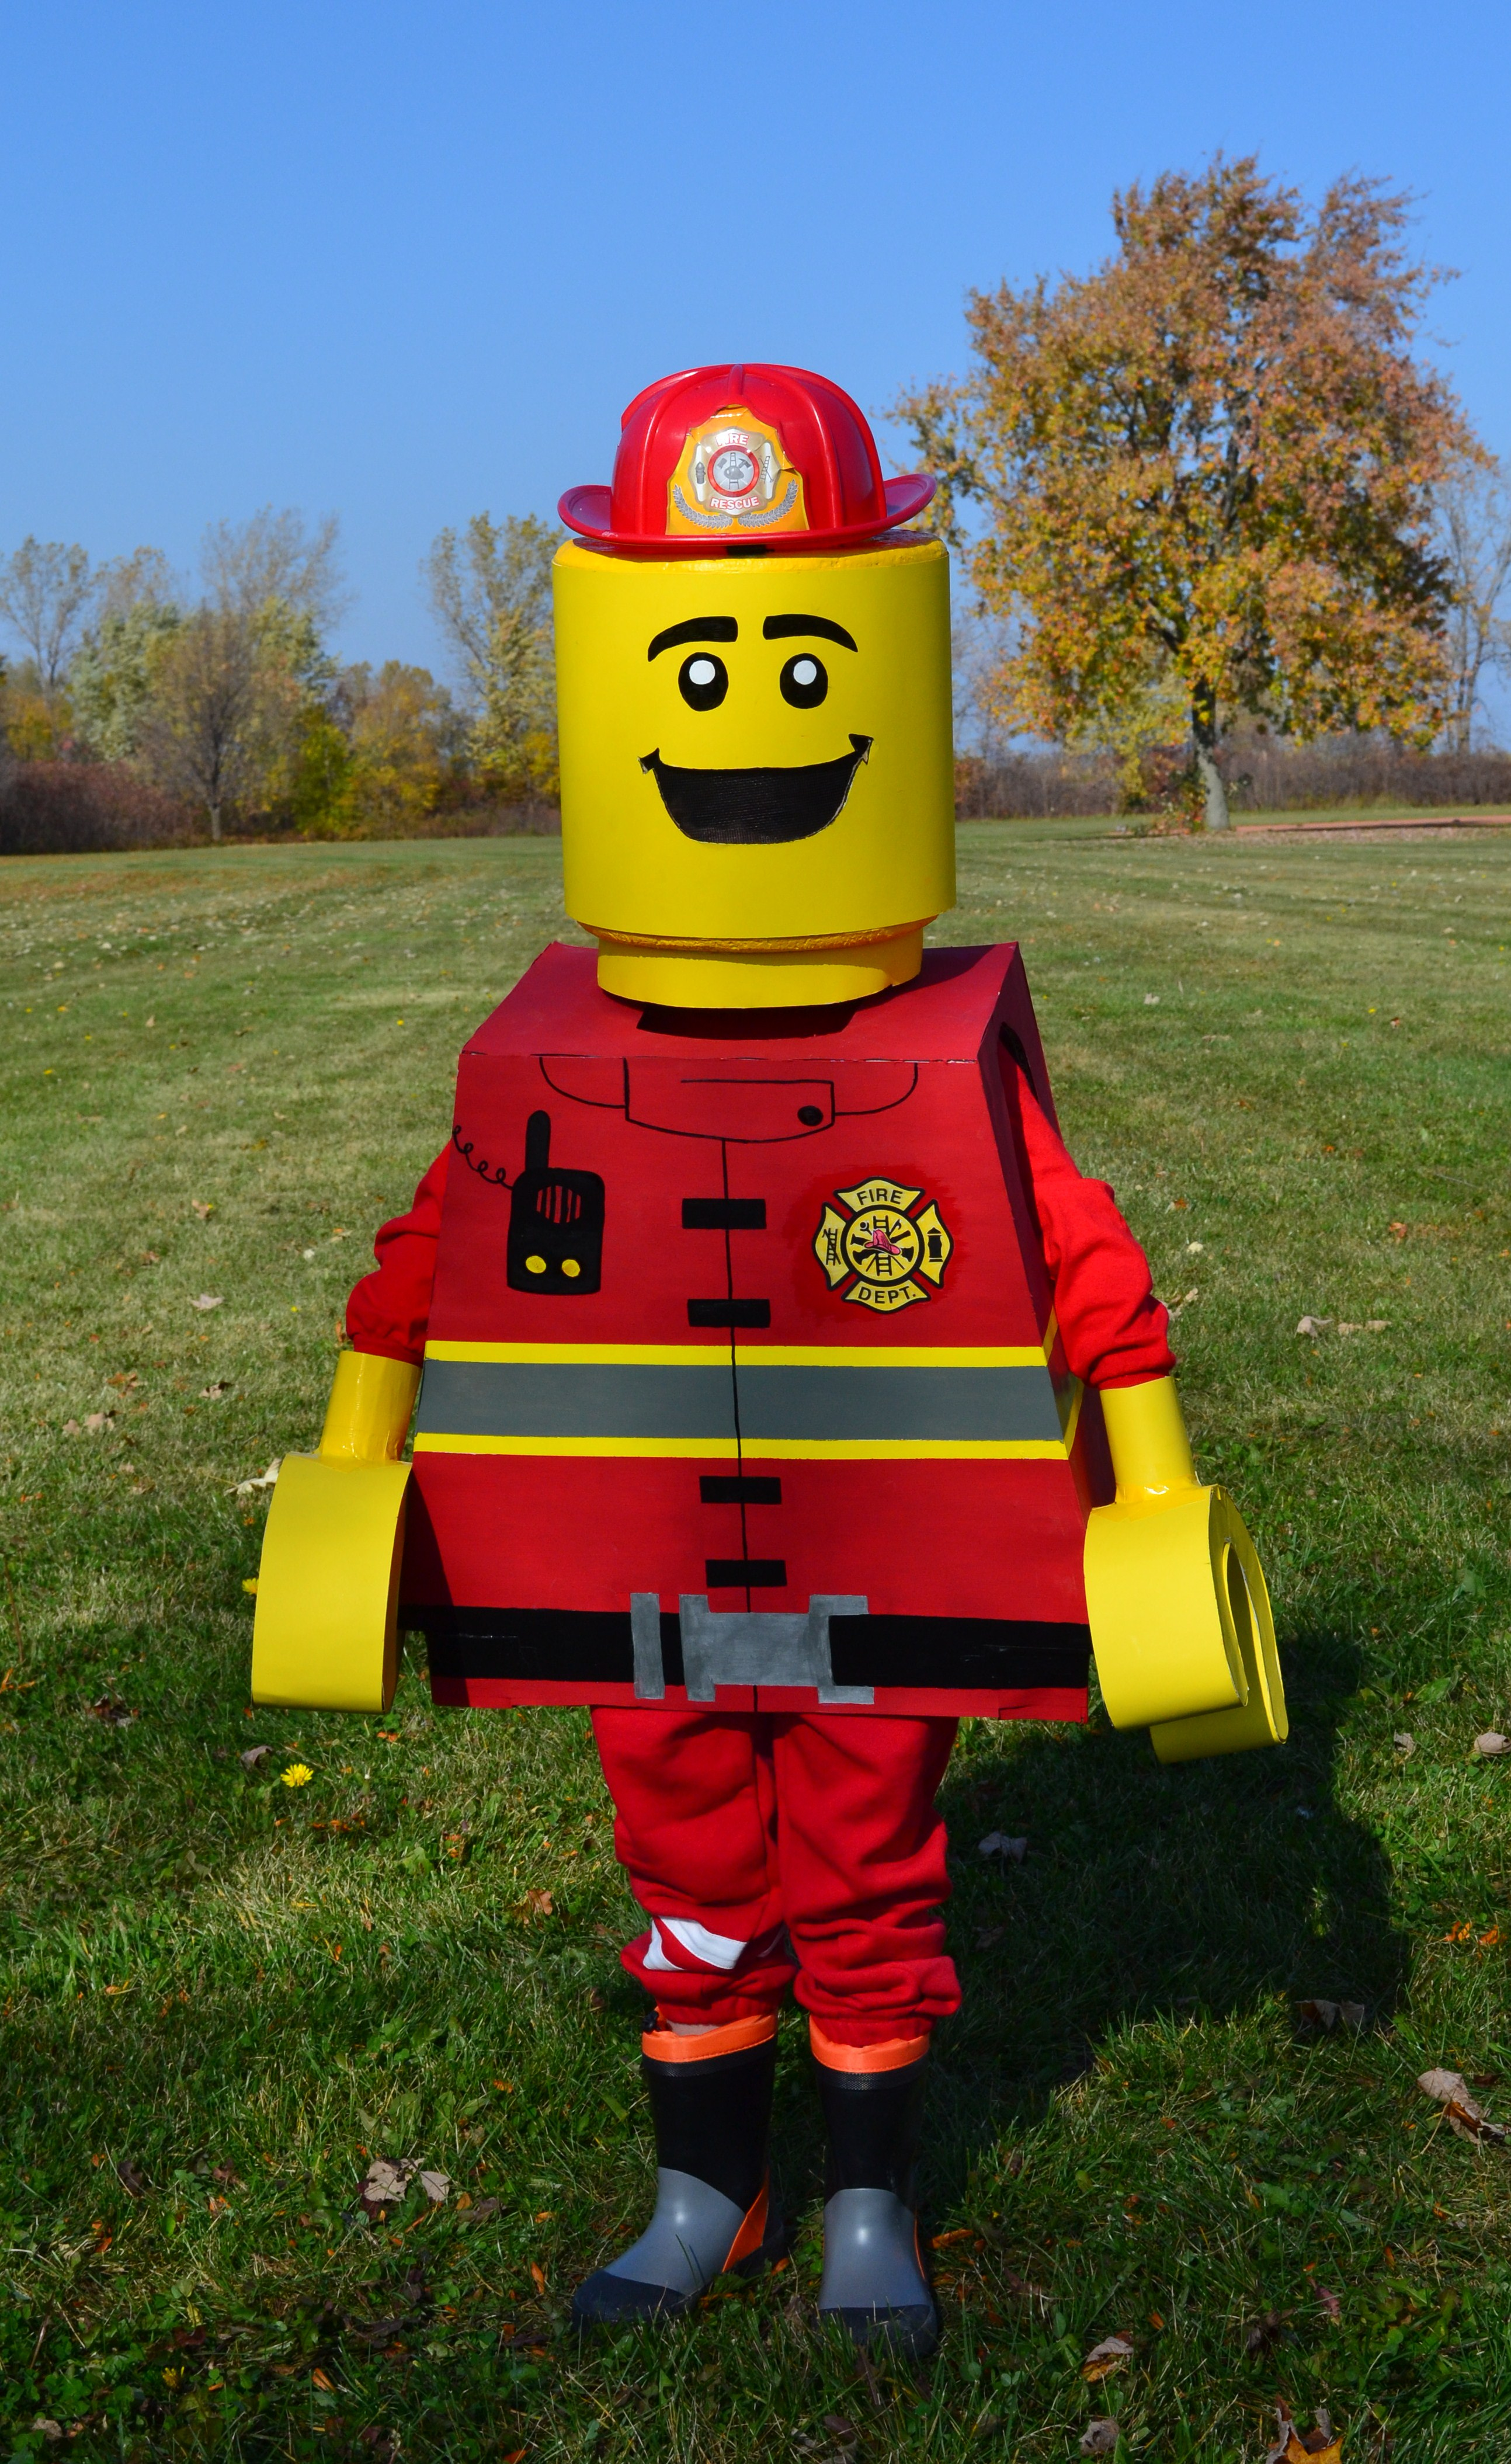 Picture of Lego Fireman Minifigure Costume